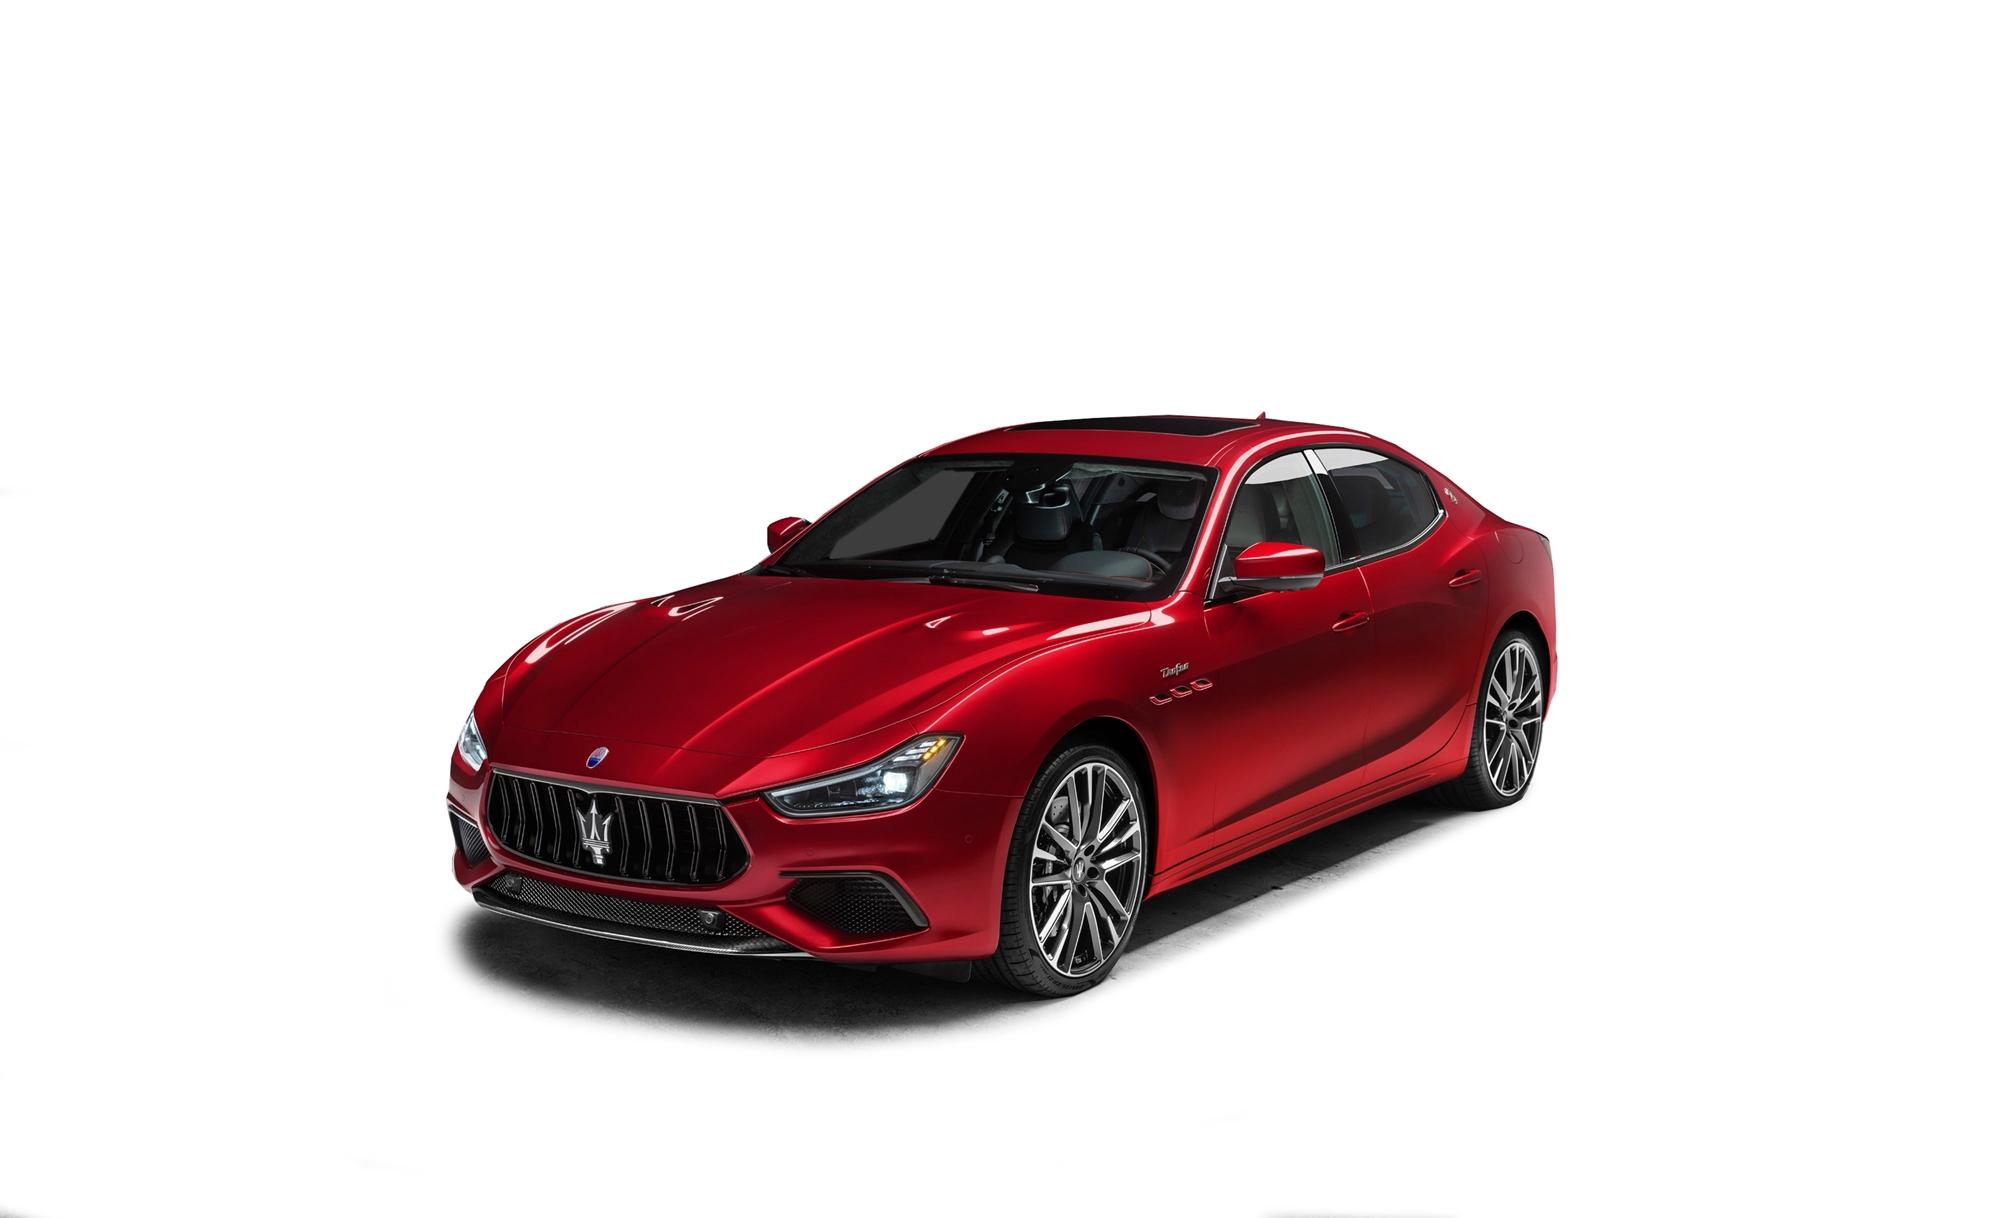 2021 Maserati Ghibli Trofeo Full Specs, Features and Price ...